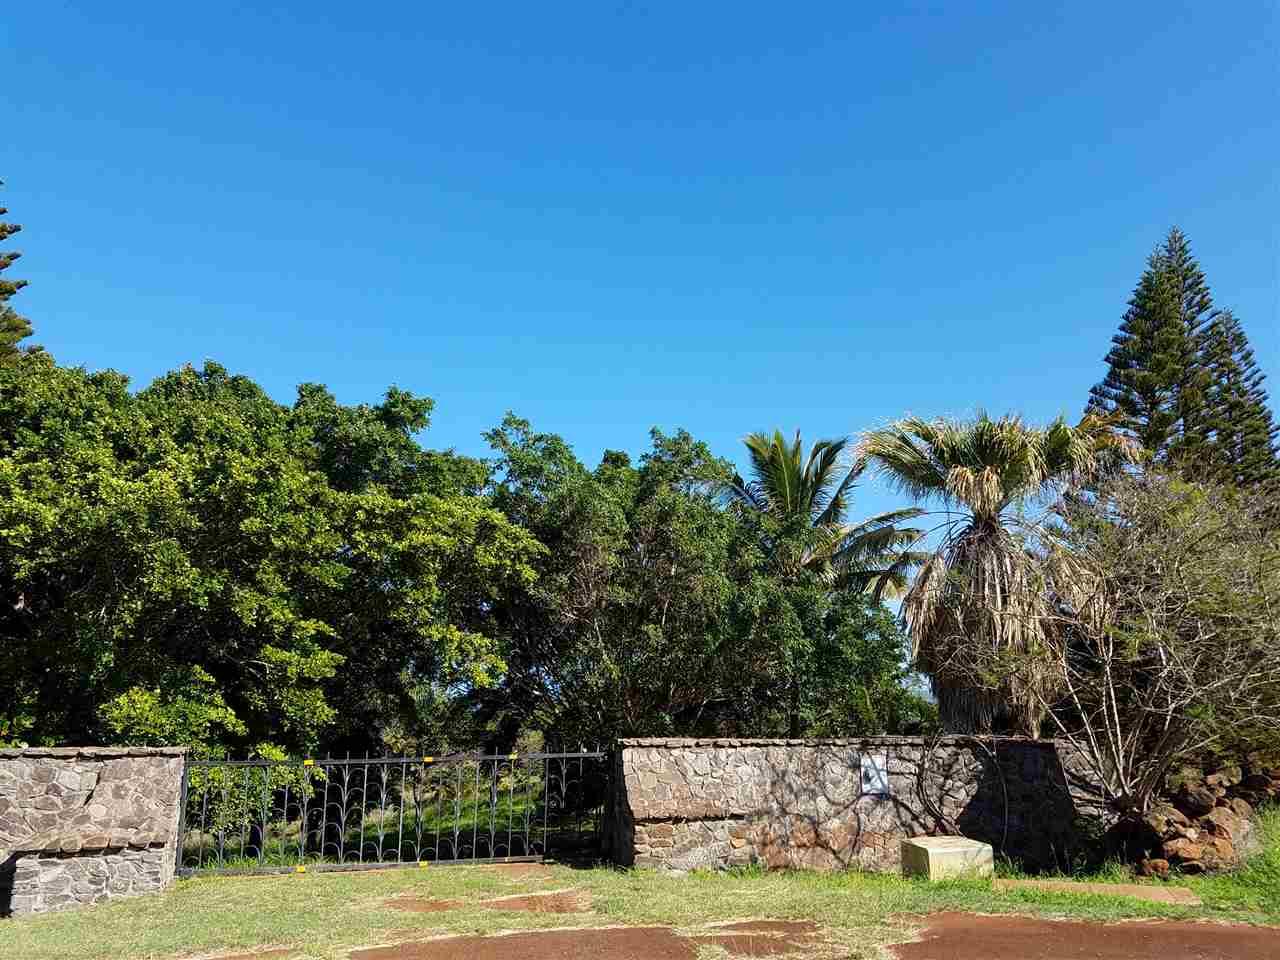 Lot 247 Papapa, Maunaloa, HI 96770